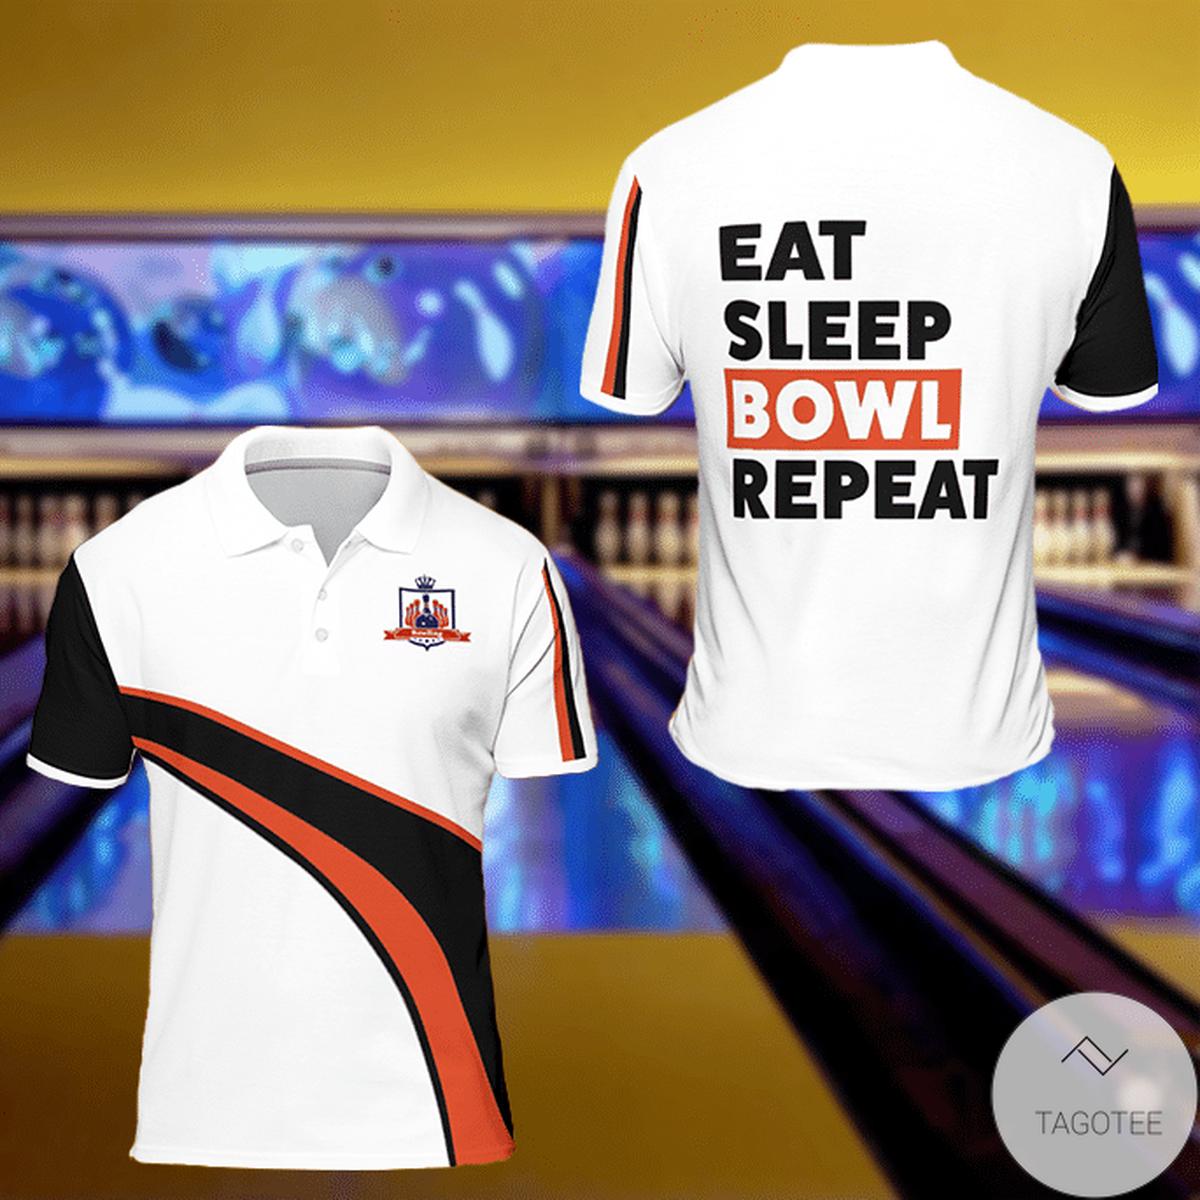 Limited Edition Eat Sleep Bowl Repeat Polo Shirt